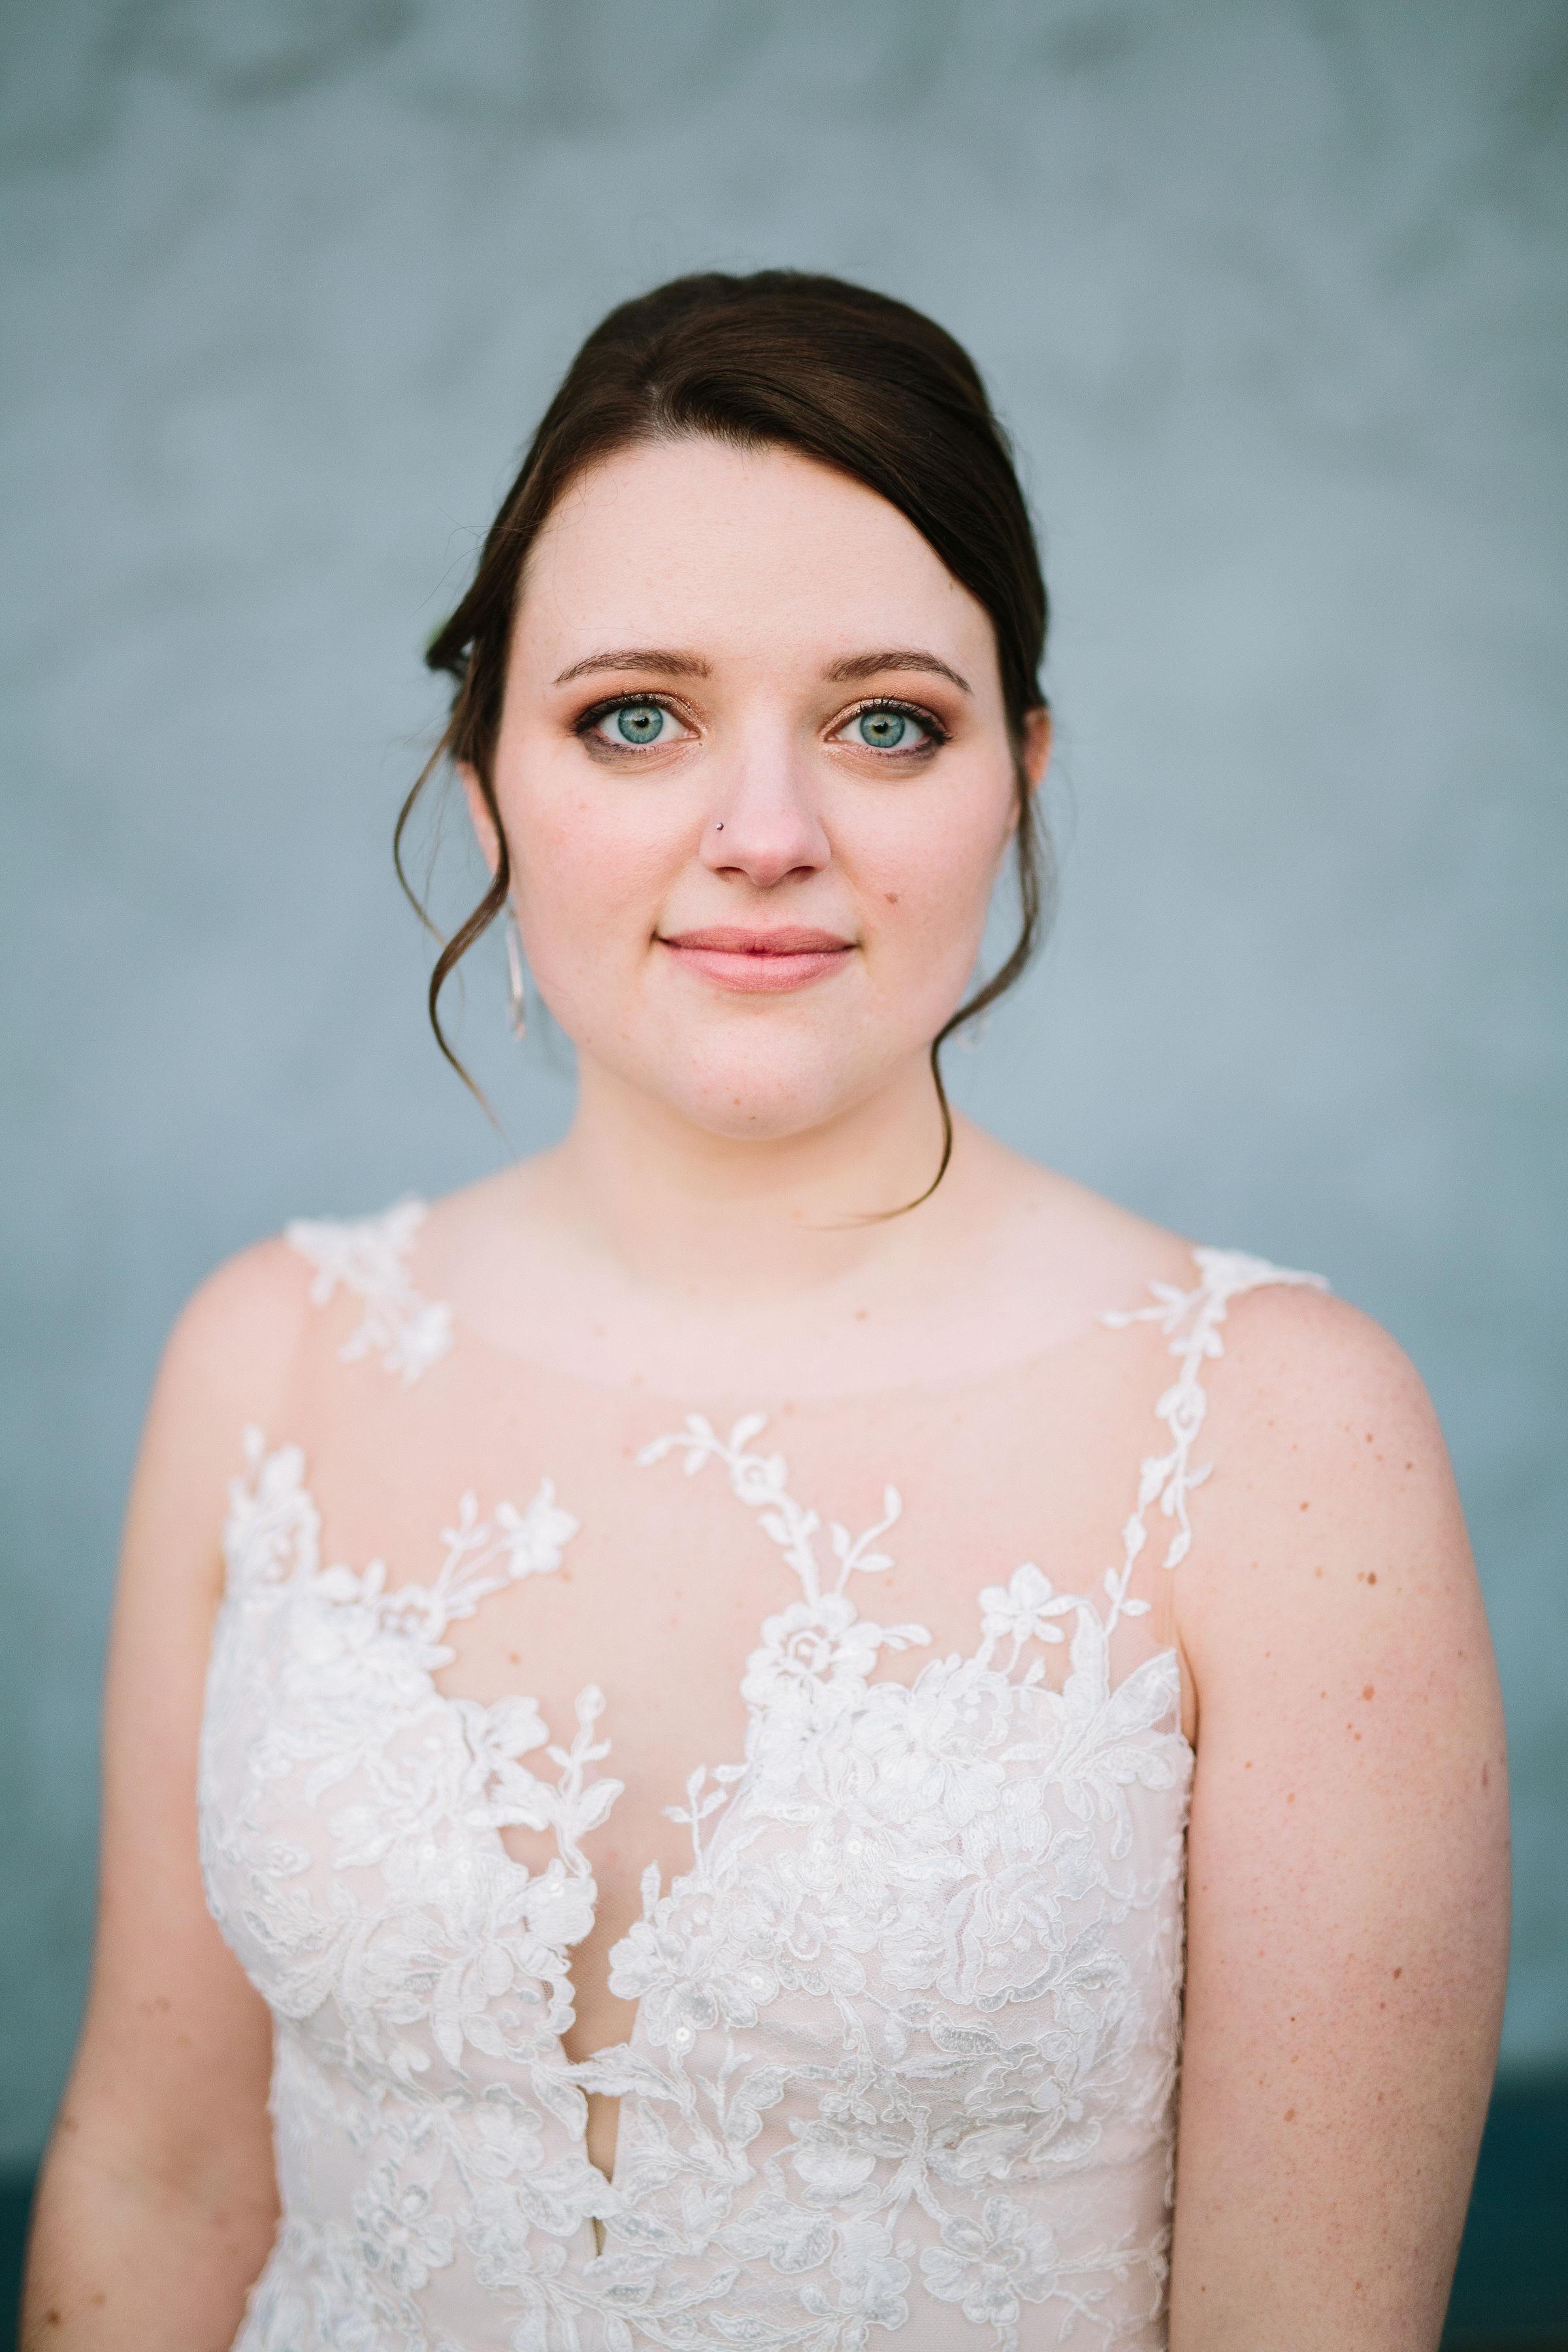 Fun Rustic spokane wedding portrait bride nose ring blue eyes up-do hair